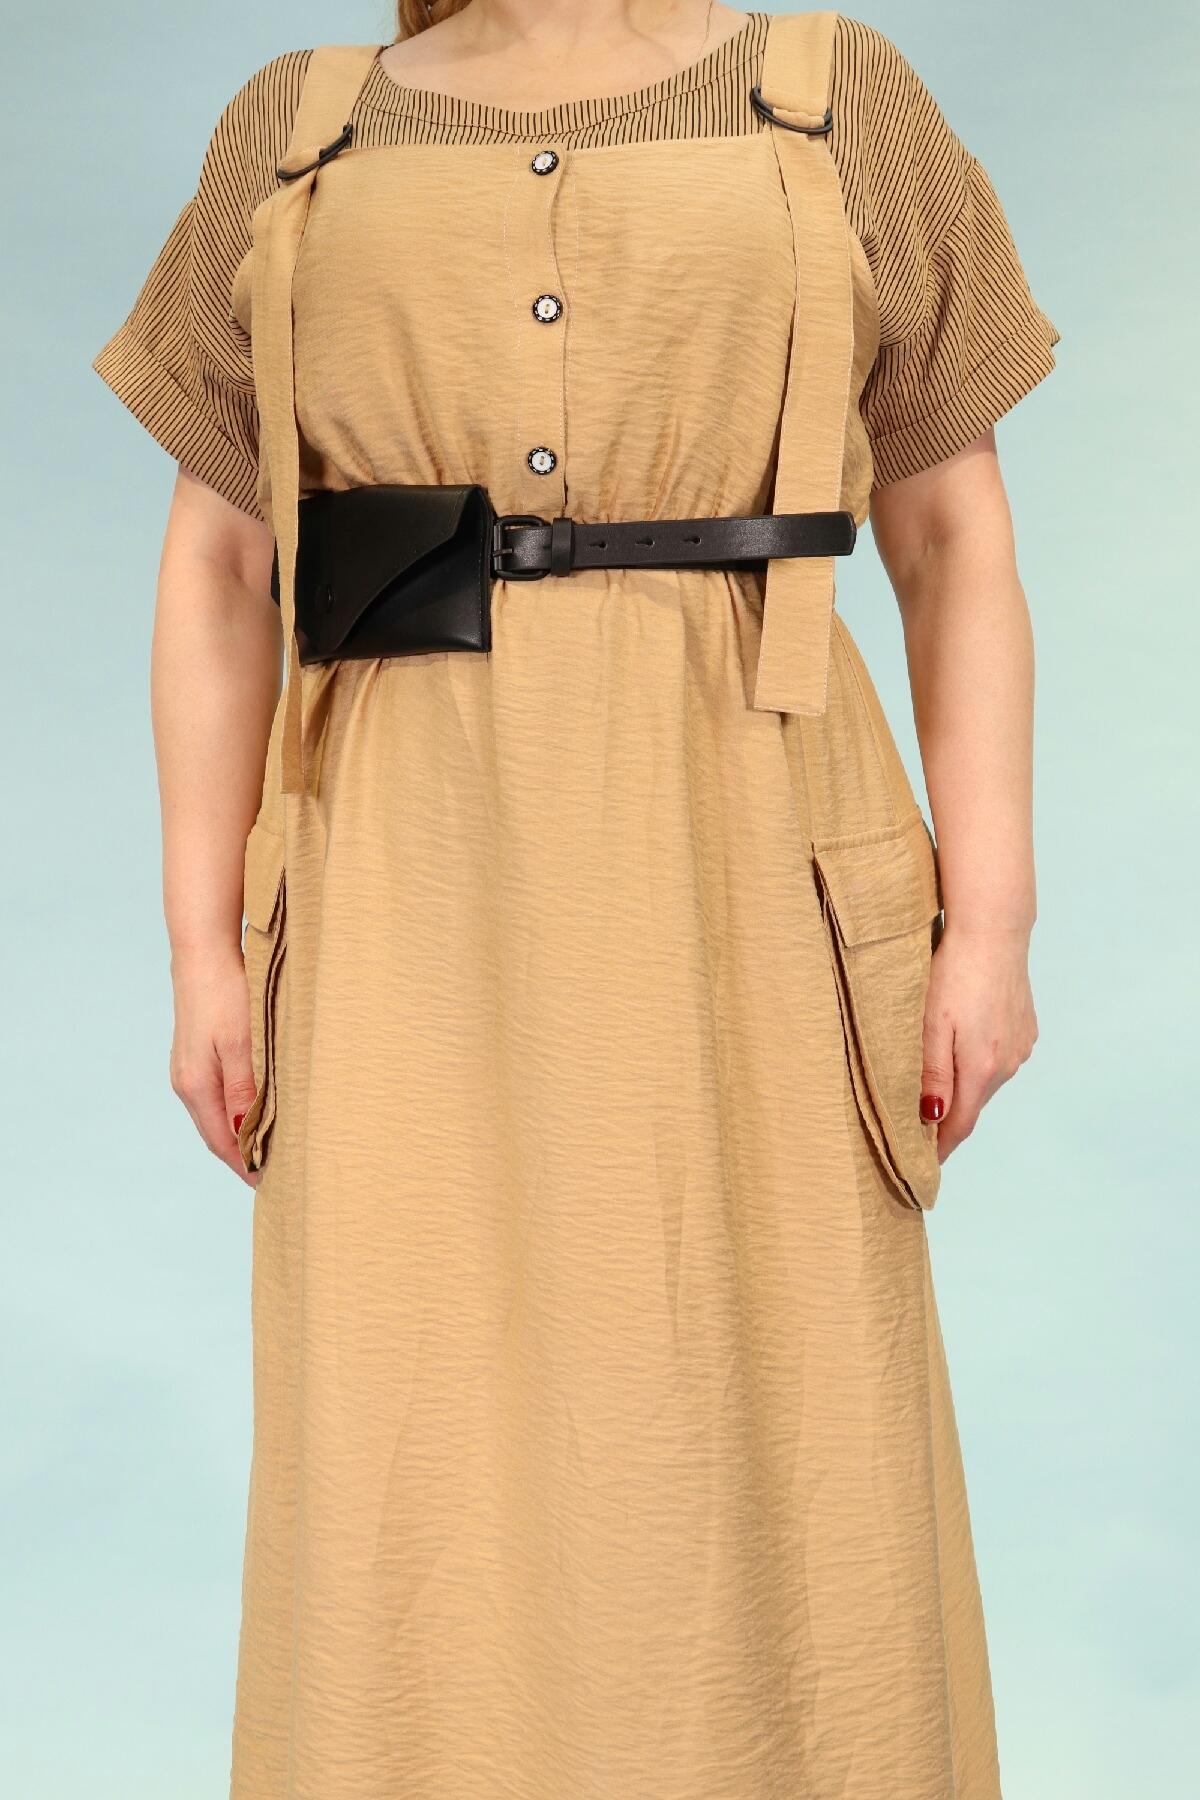 Day Dresses Medium-Camel